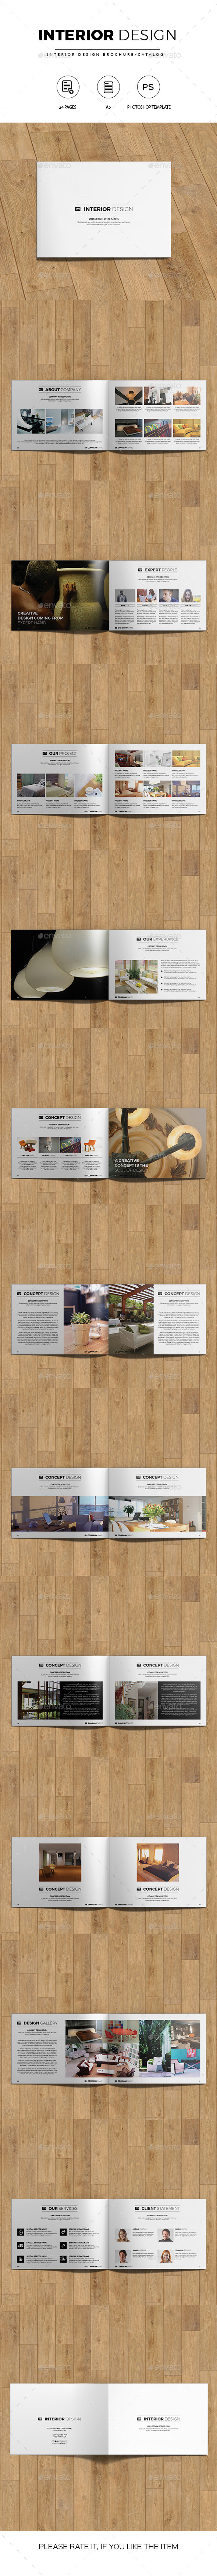 Minimal Interior Design Catalog/Brochure - Catalogs Brochures